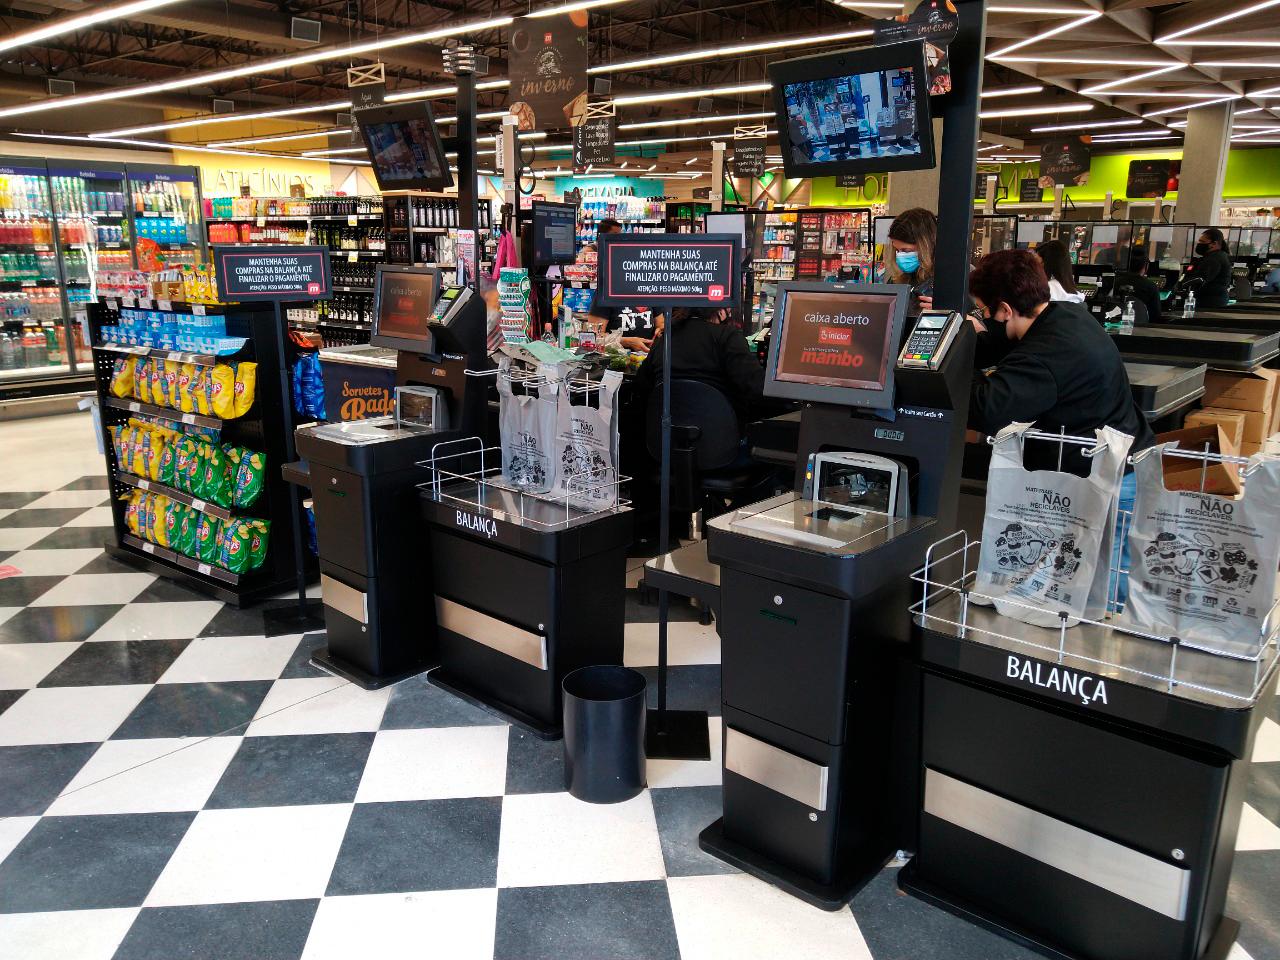 equipamentos de self checkout